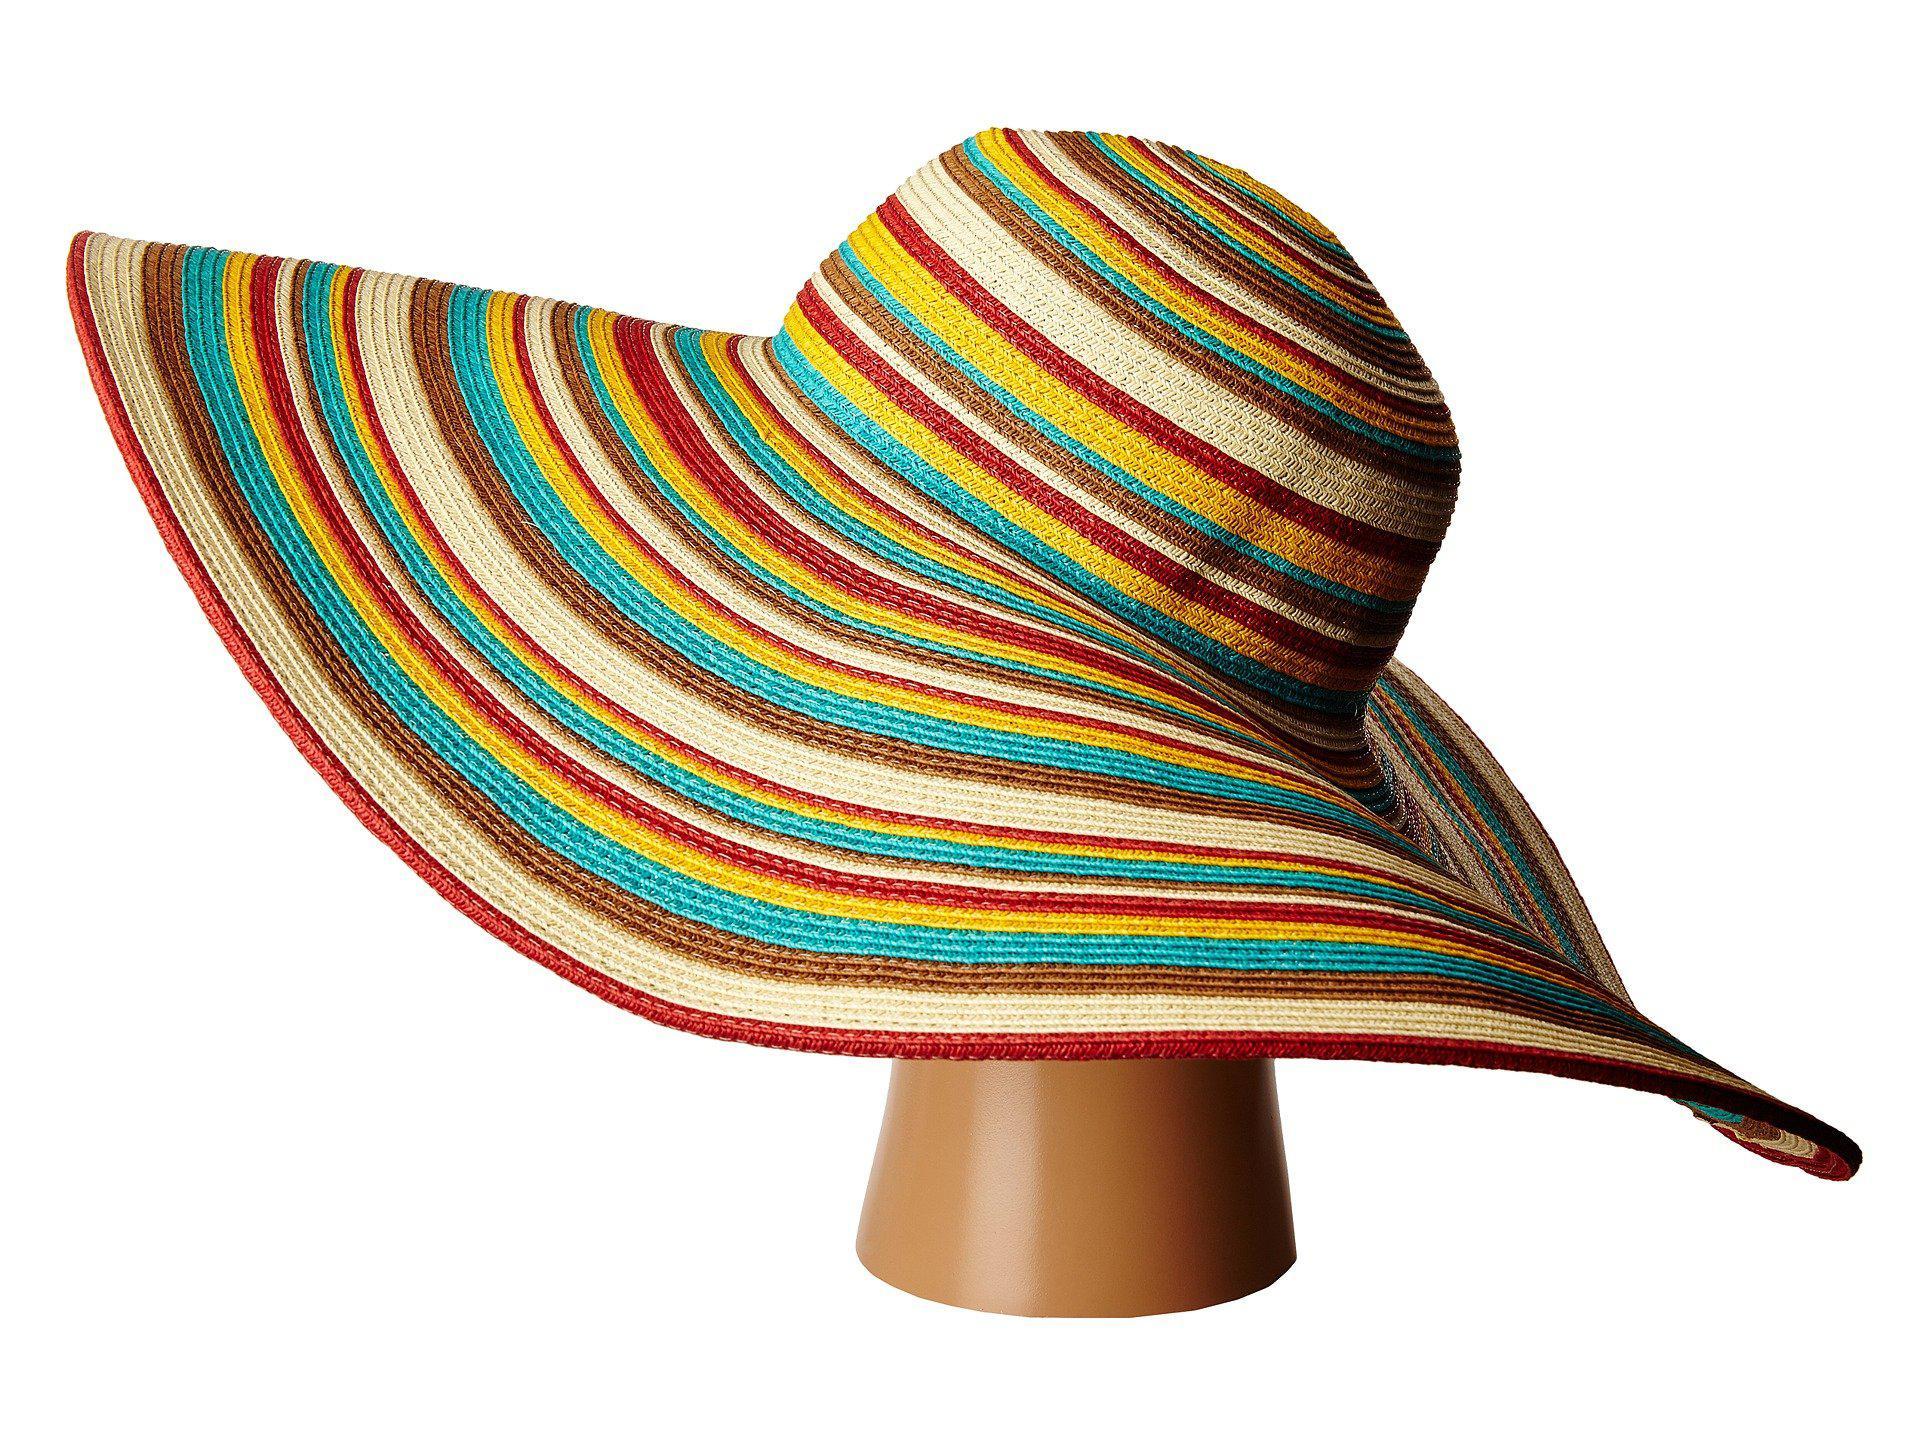 edc145d11fd San Diego Hat Company - Brown Ubx2721 Striped Floppy 8 Inch Brim Sun Hat  (multi. View fullscreen